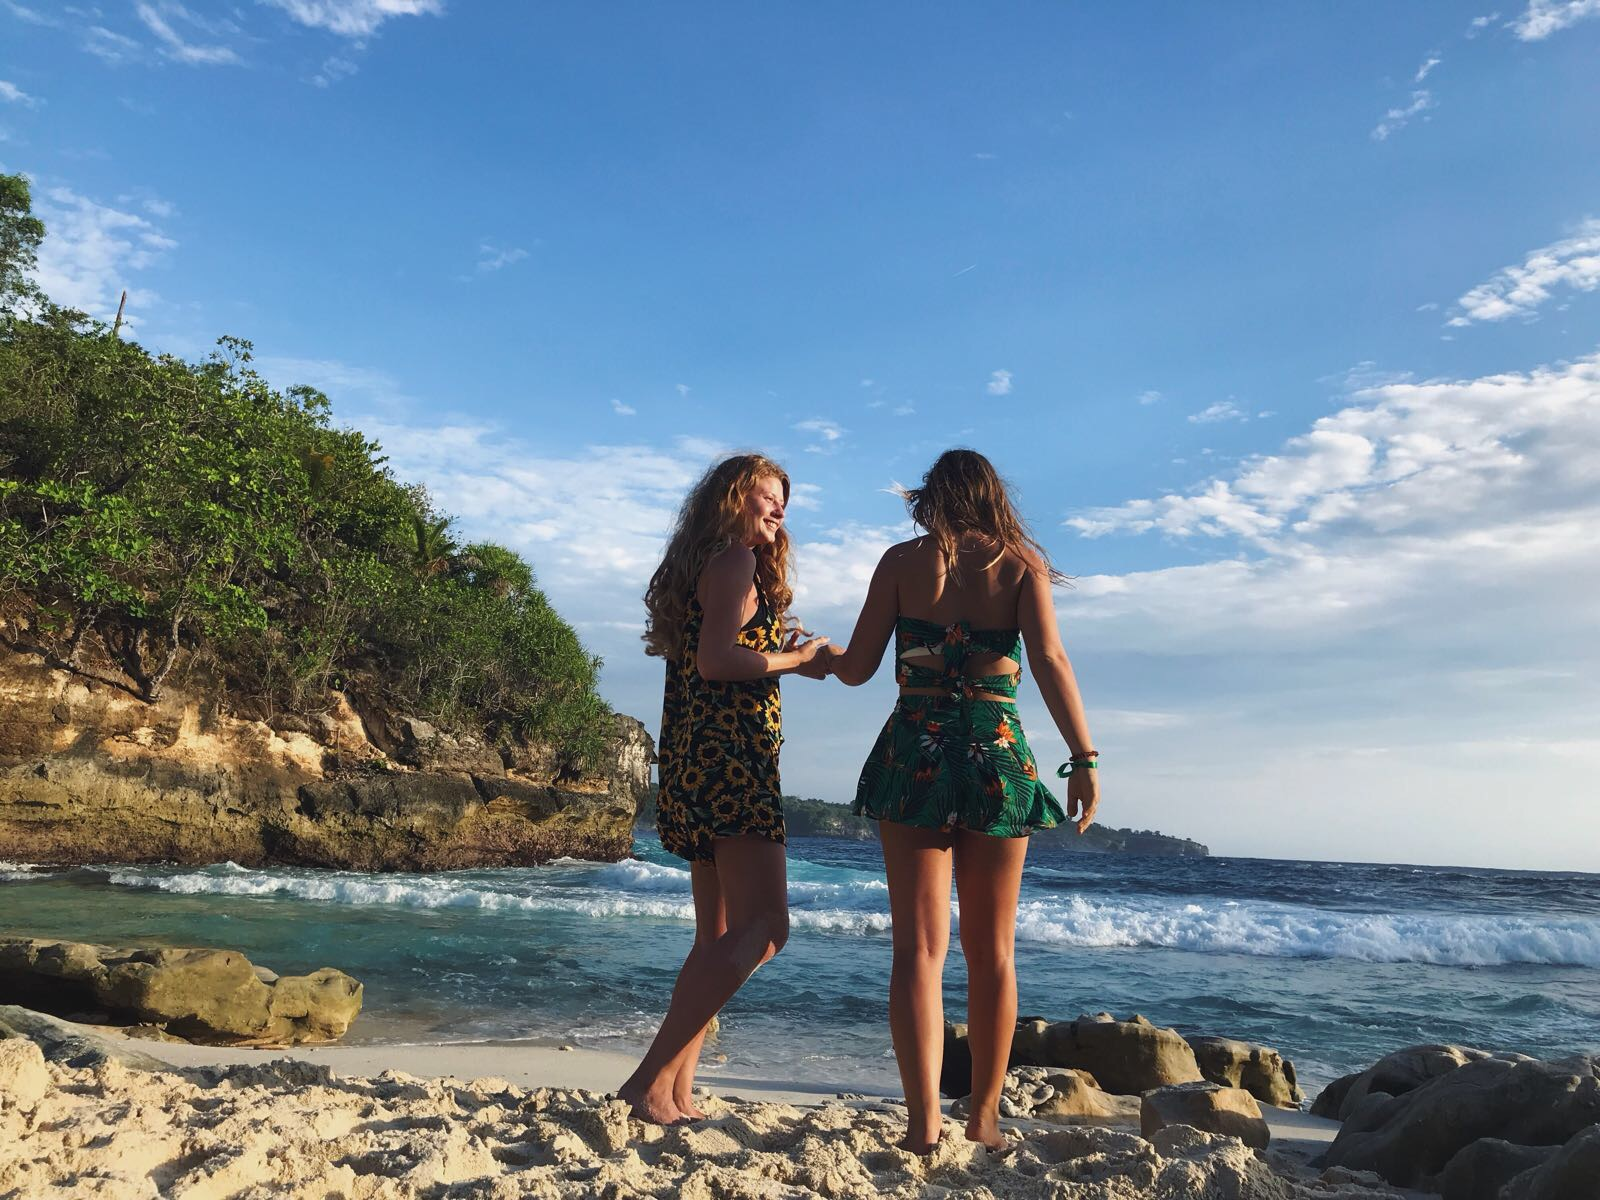 Wat te doen in Nusa Lembongan